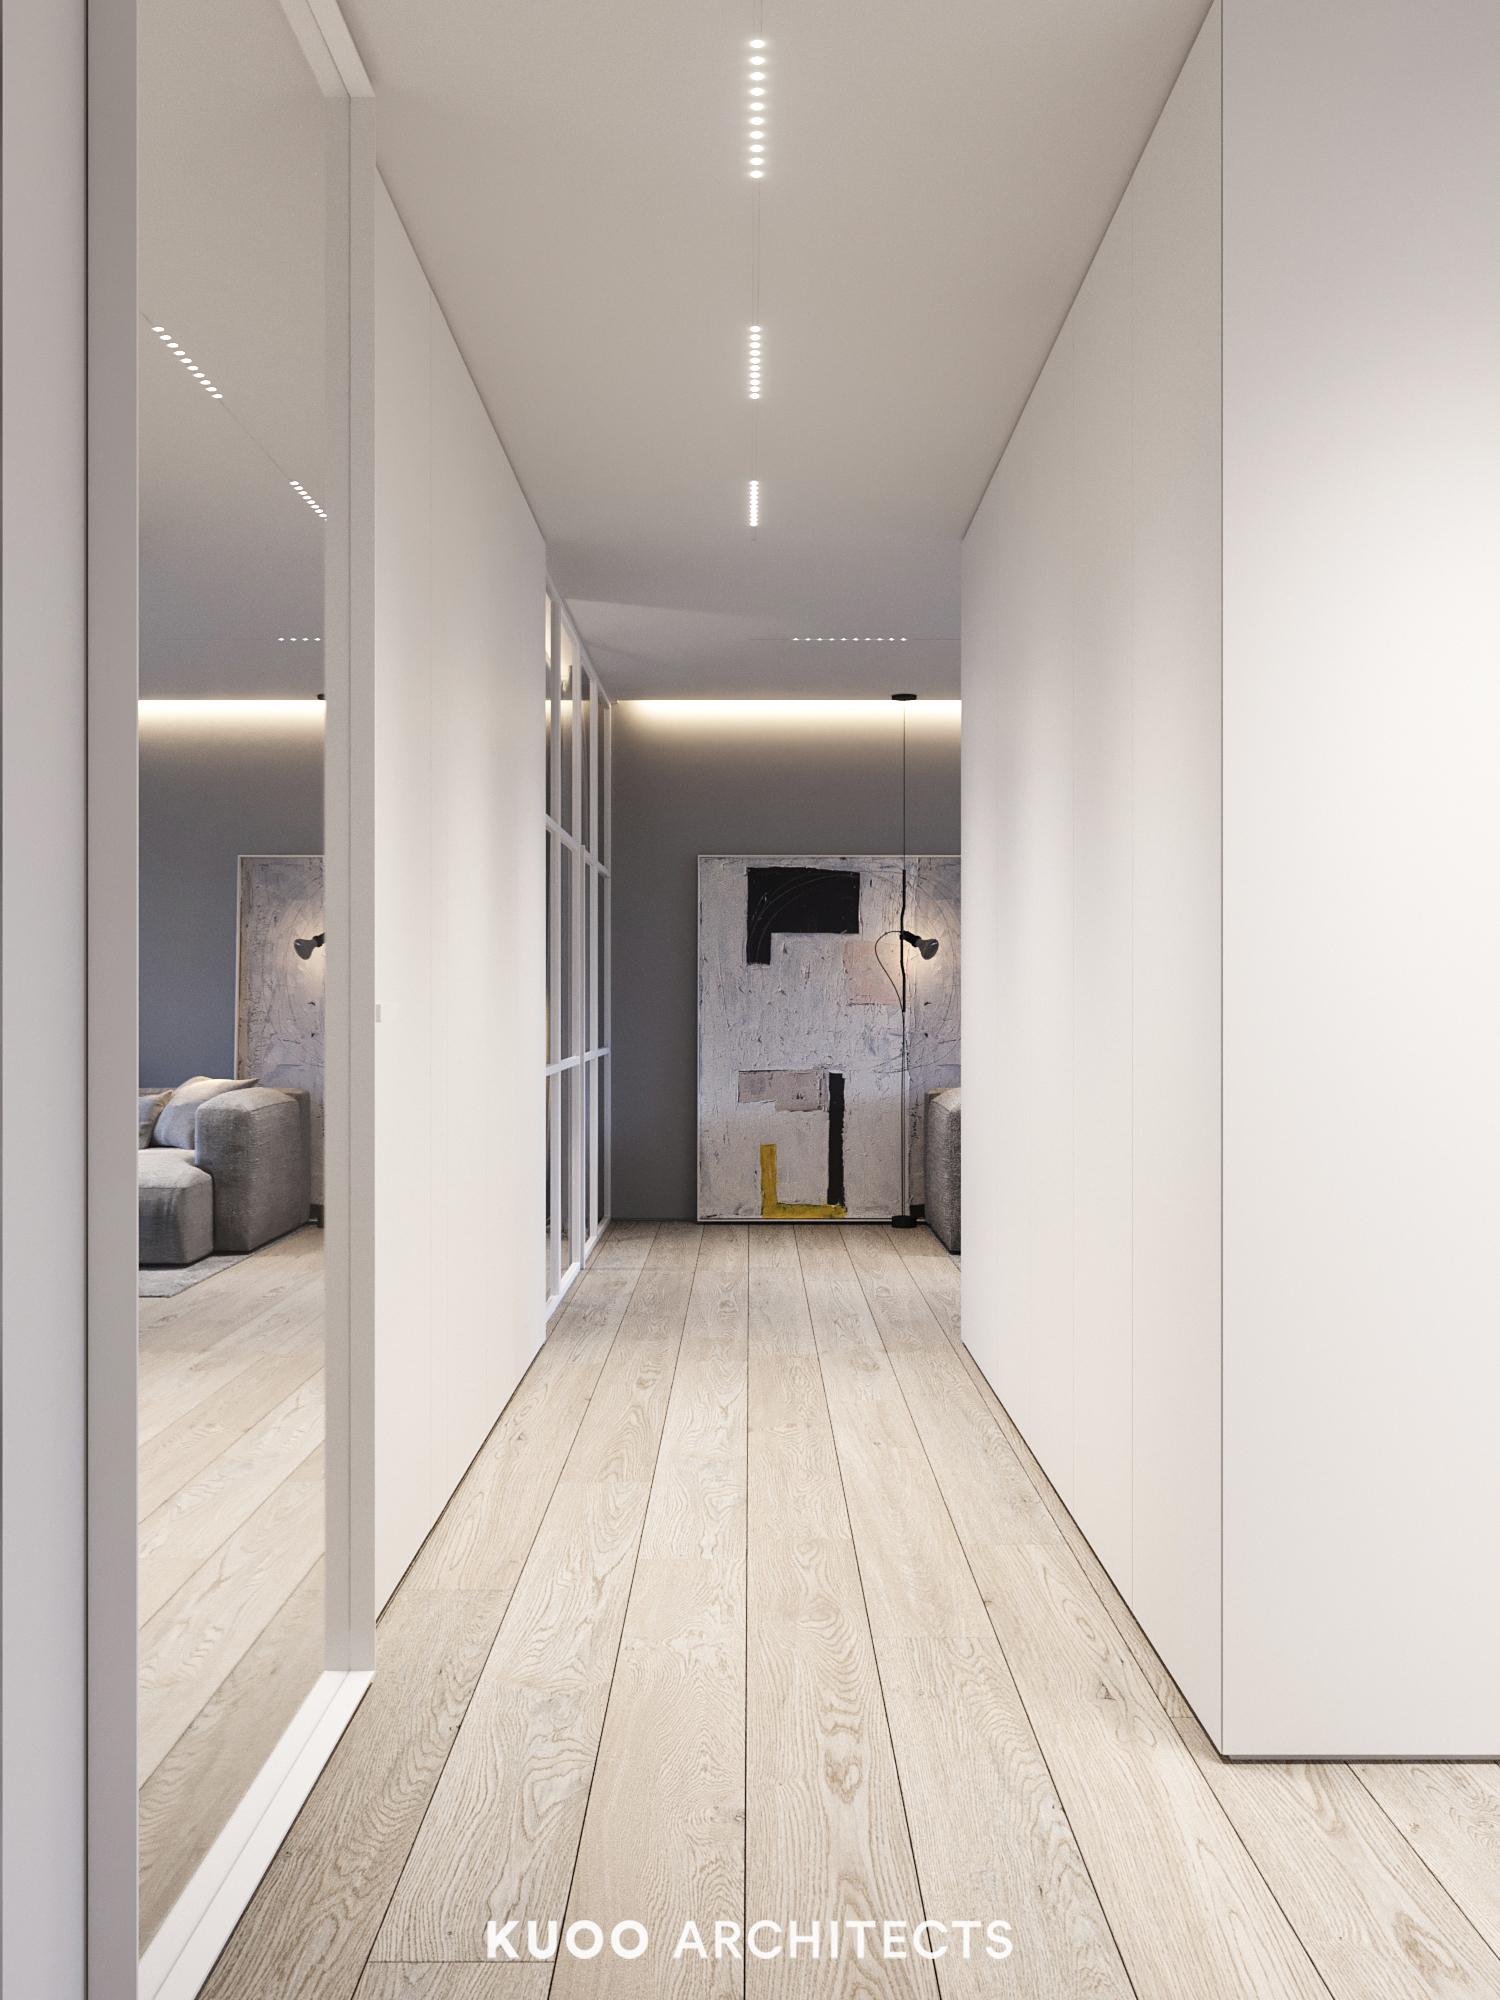 kuoo_architects_ap_warsaw_8_03